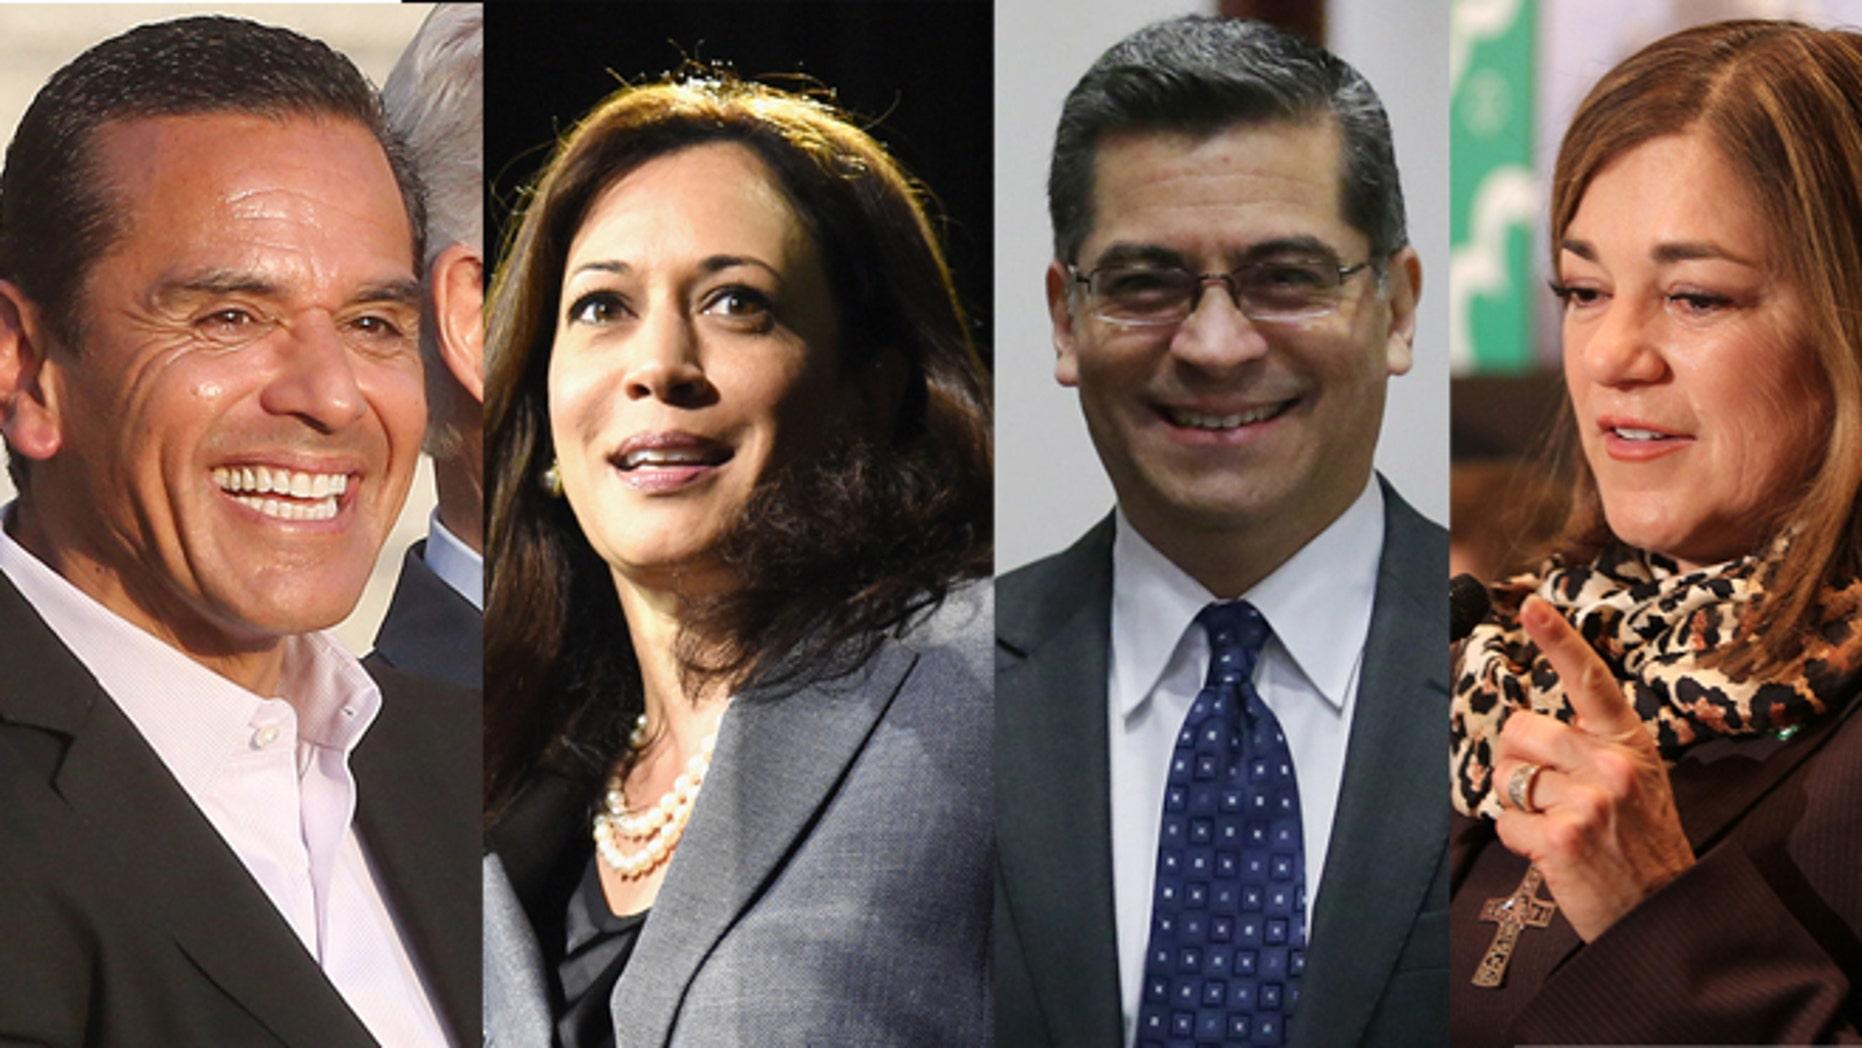 (Left to right) Former Los Angeles Mayor Antonio Villaraigosa, California Attorney General Kamala Harris, Rep. Xavier Becerra, and Rep. Loretta Sanchez.